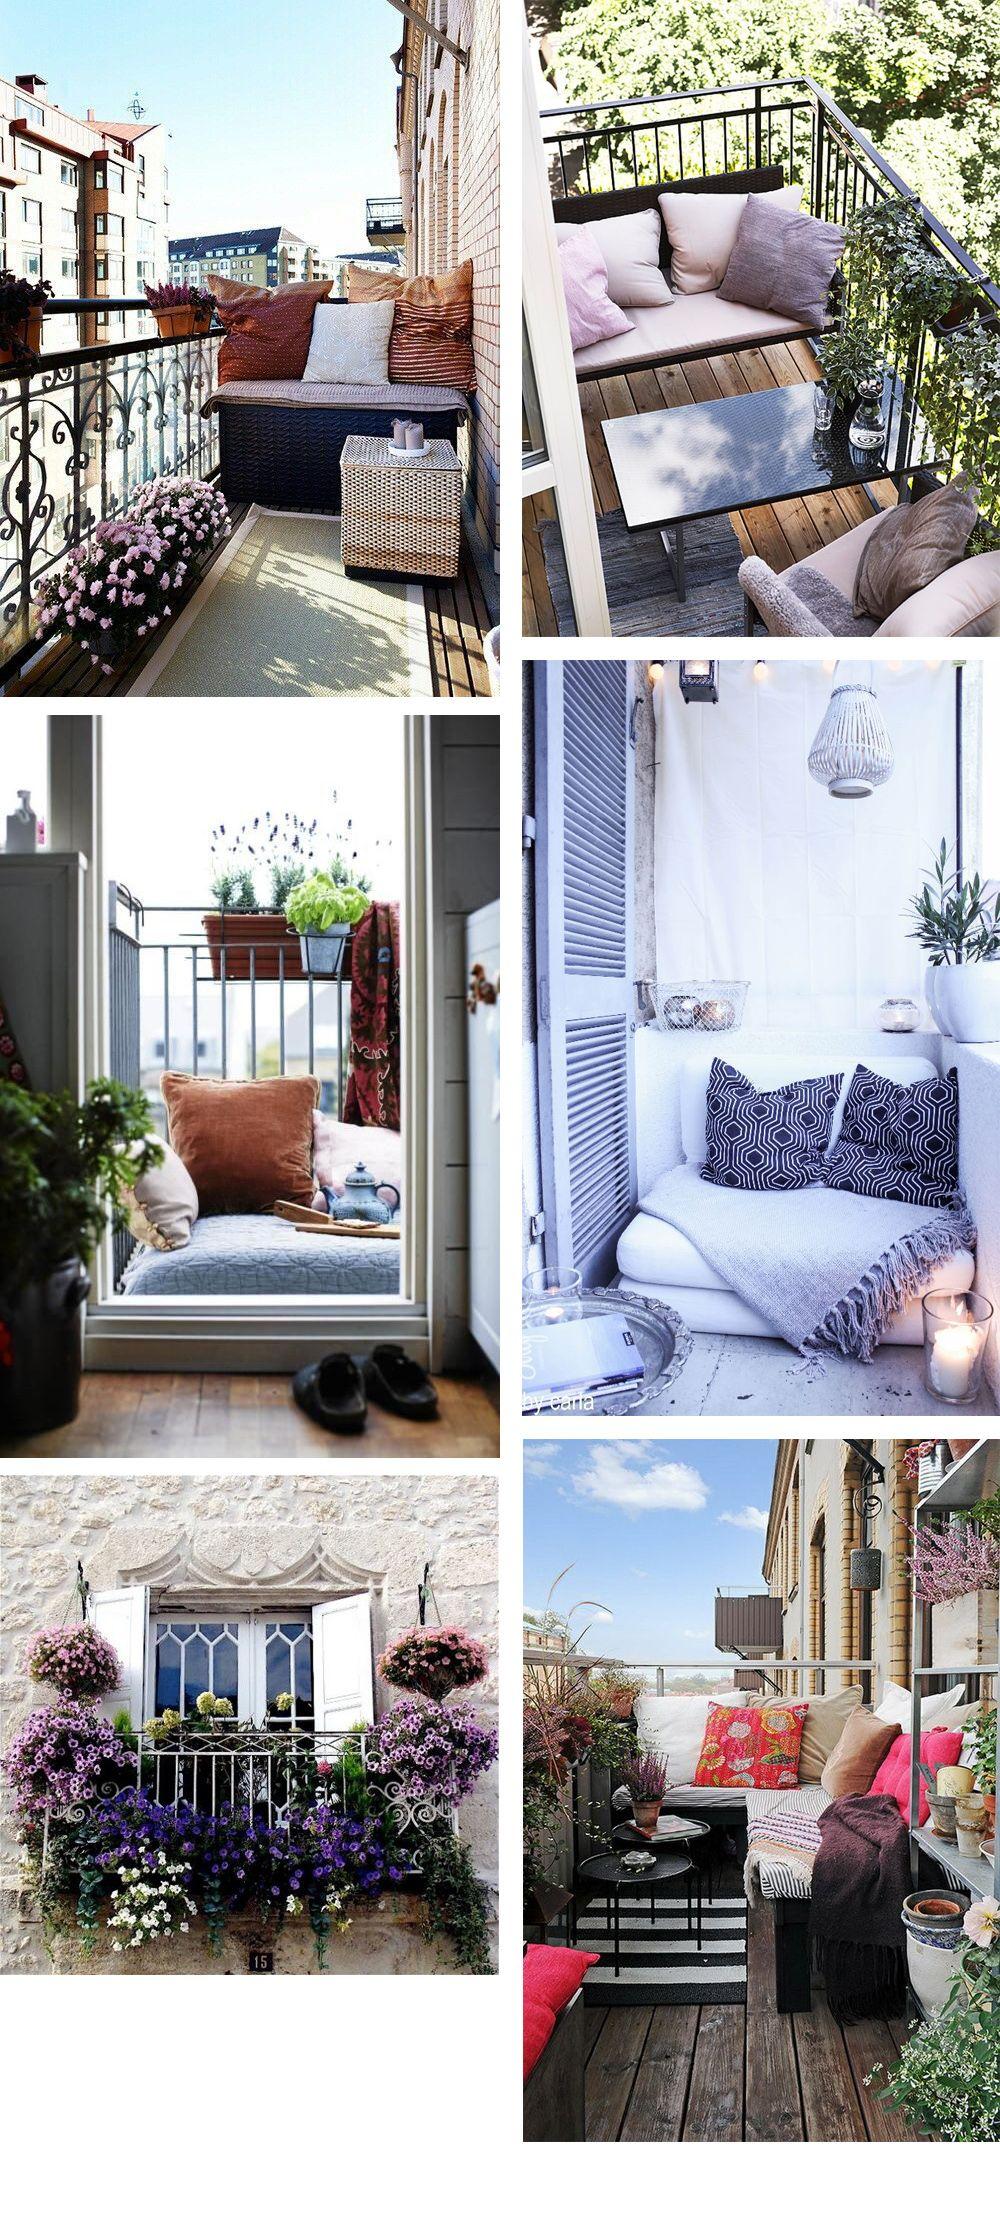 5 tips for small balconies my place pinterest balcon terraza balcon decoracion y hogar. Black Bedroom Furniture Sets. Home Design Ideas